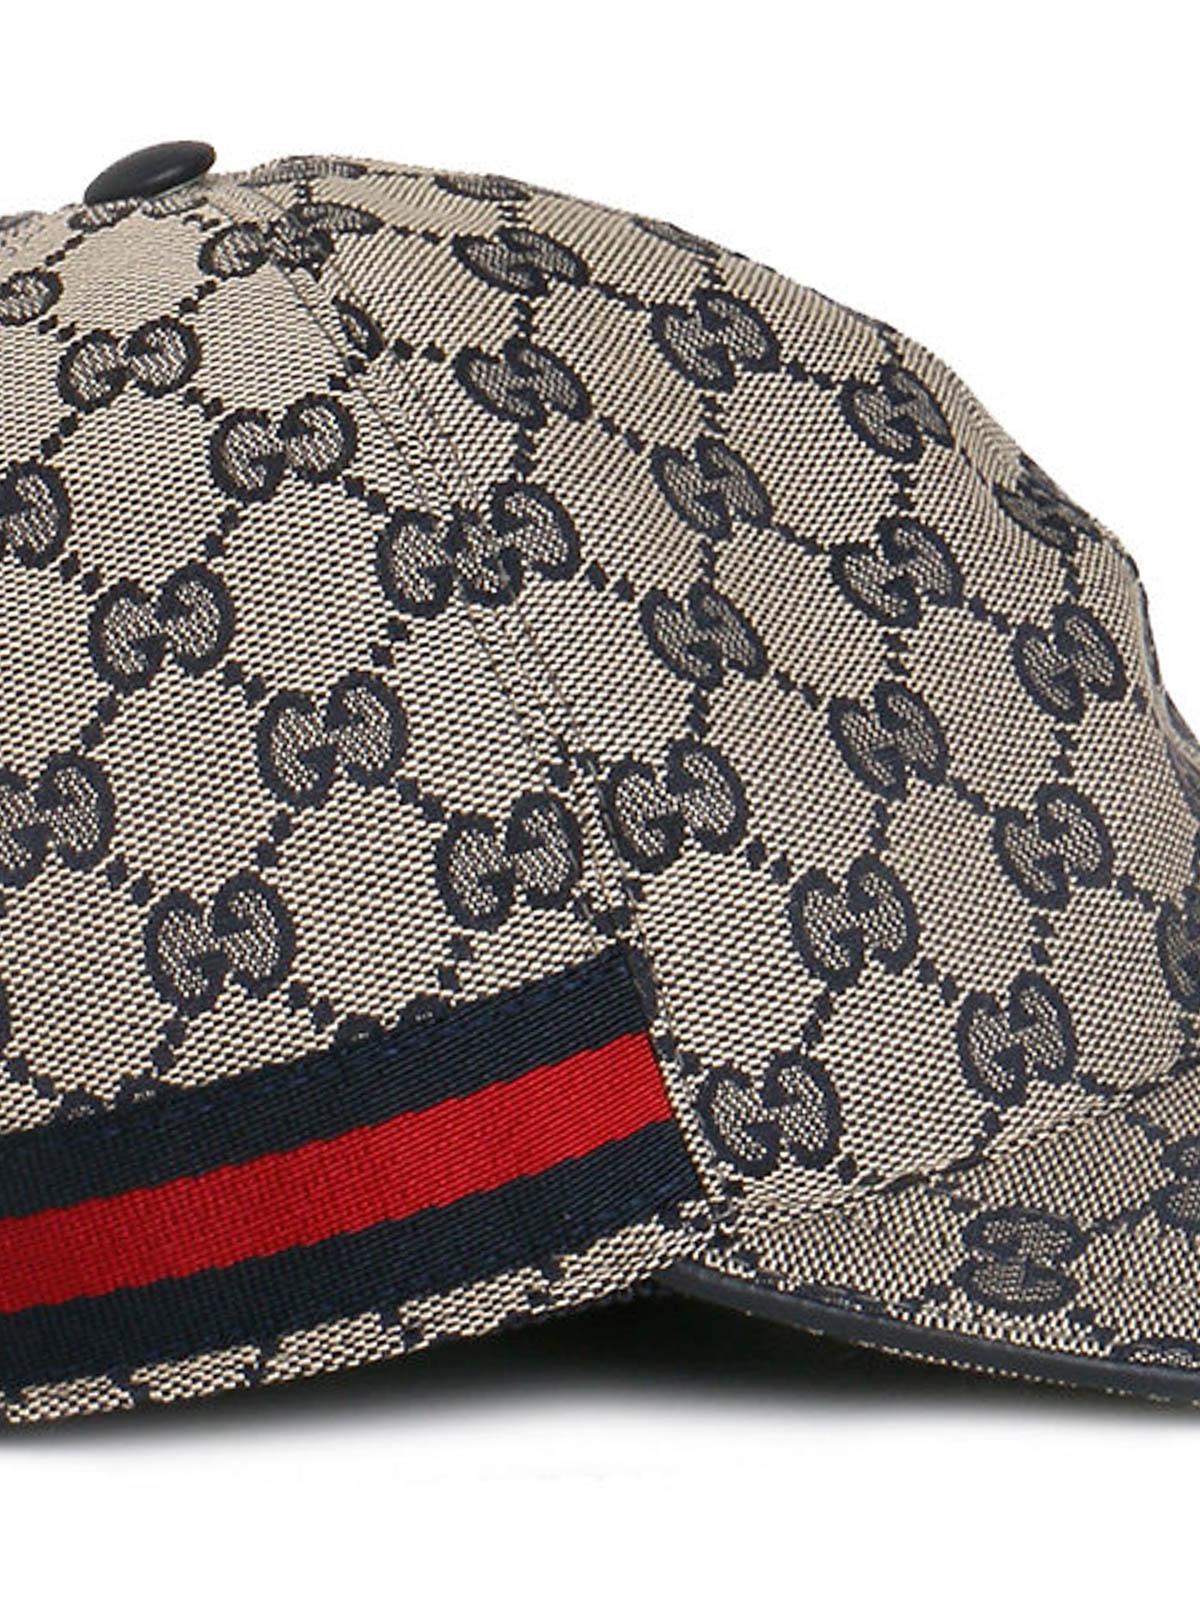 Gucci - GG supreme baseball hat - hats   caps - 200035 F4CRG 4080 7769fd55280